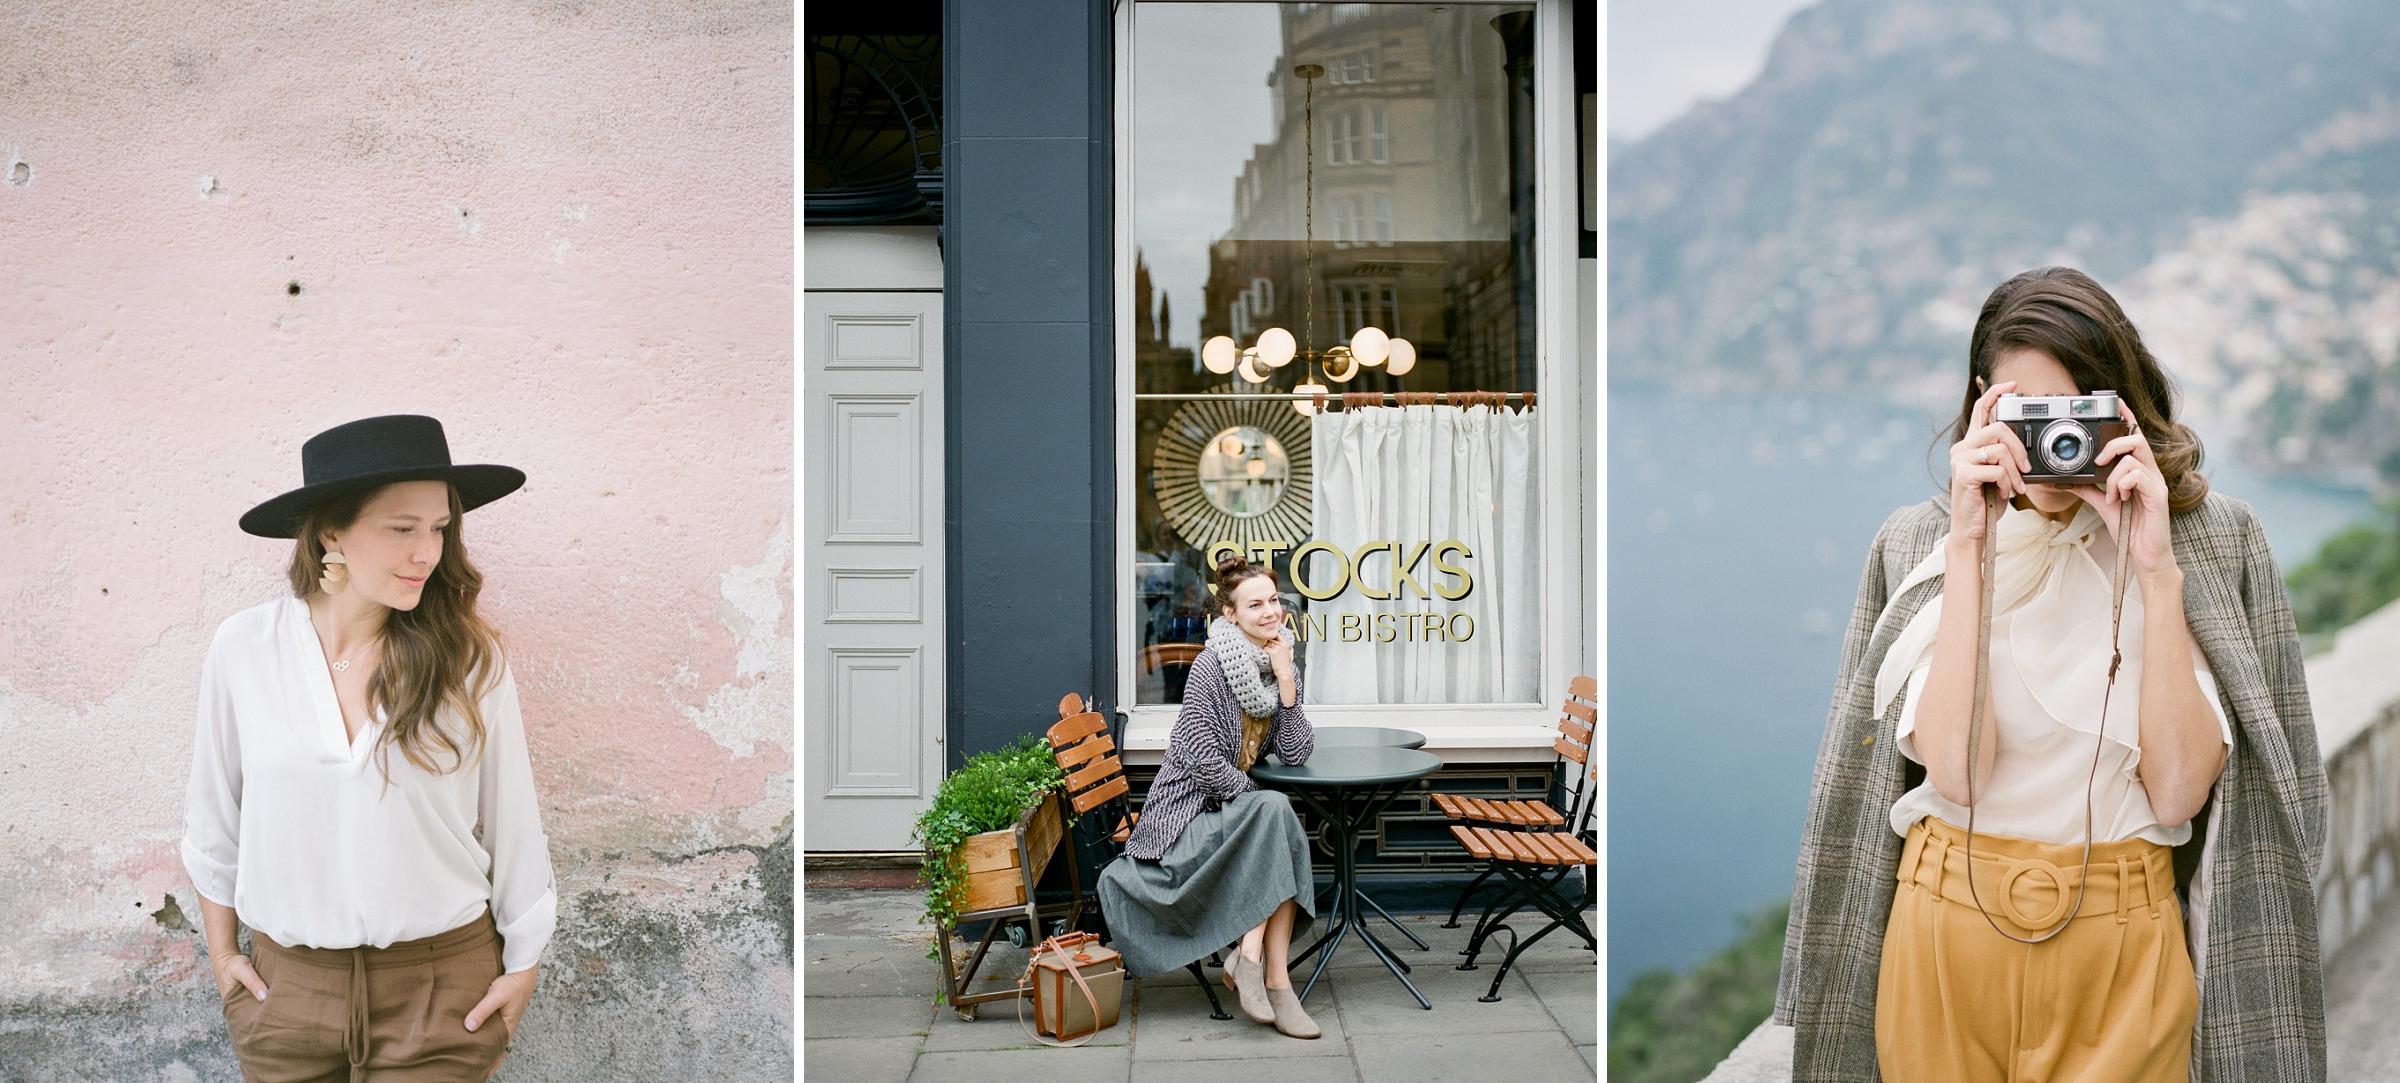 Branding Portraits-business photography-tanja kibogo.jpg